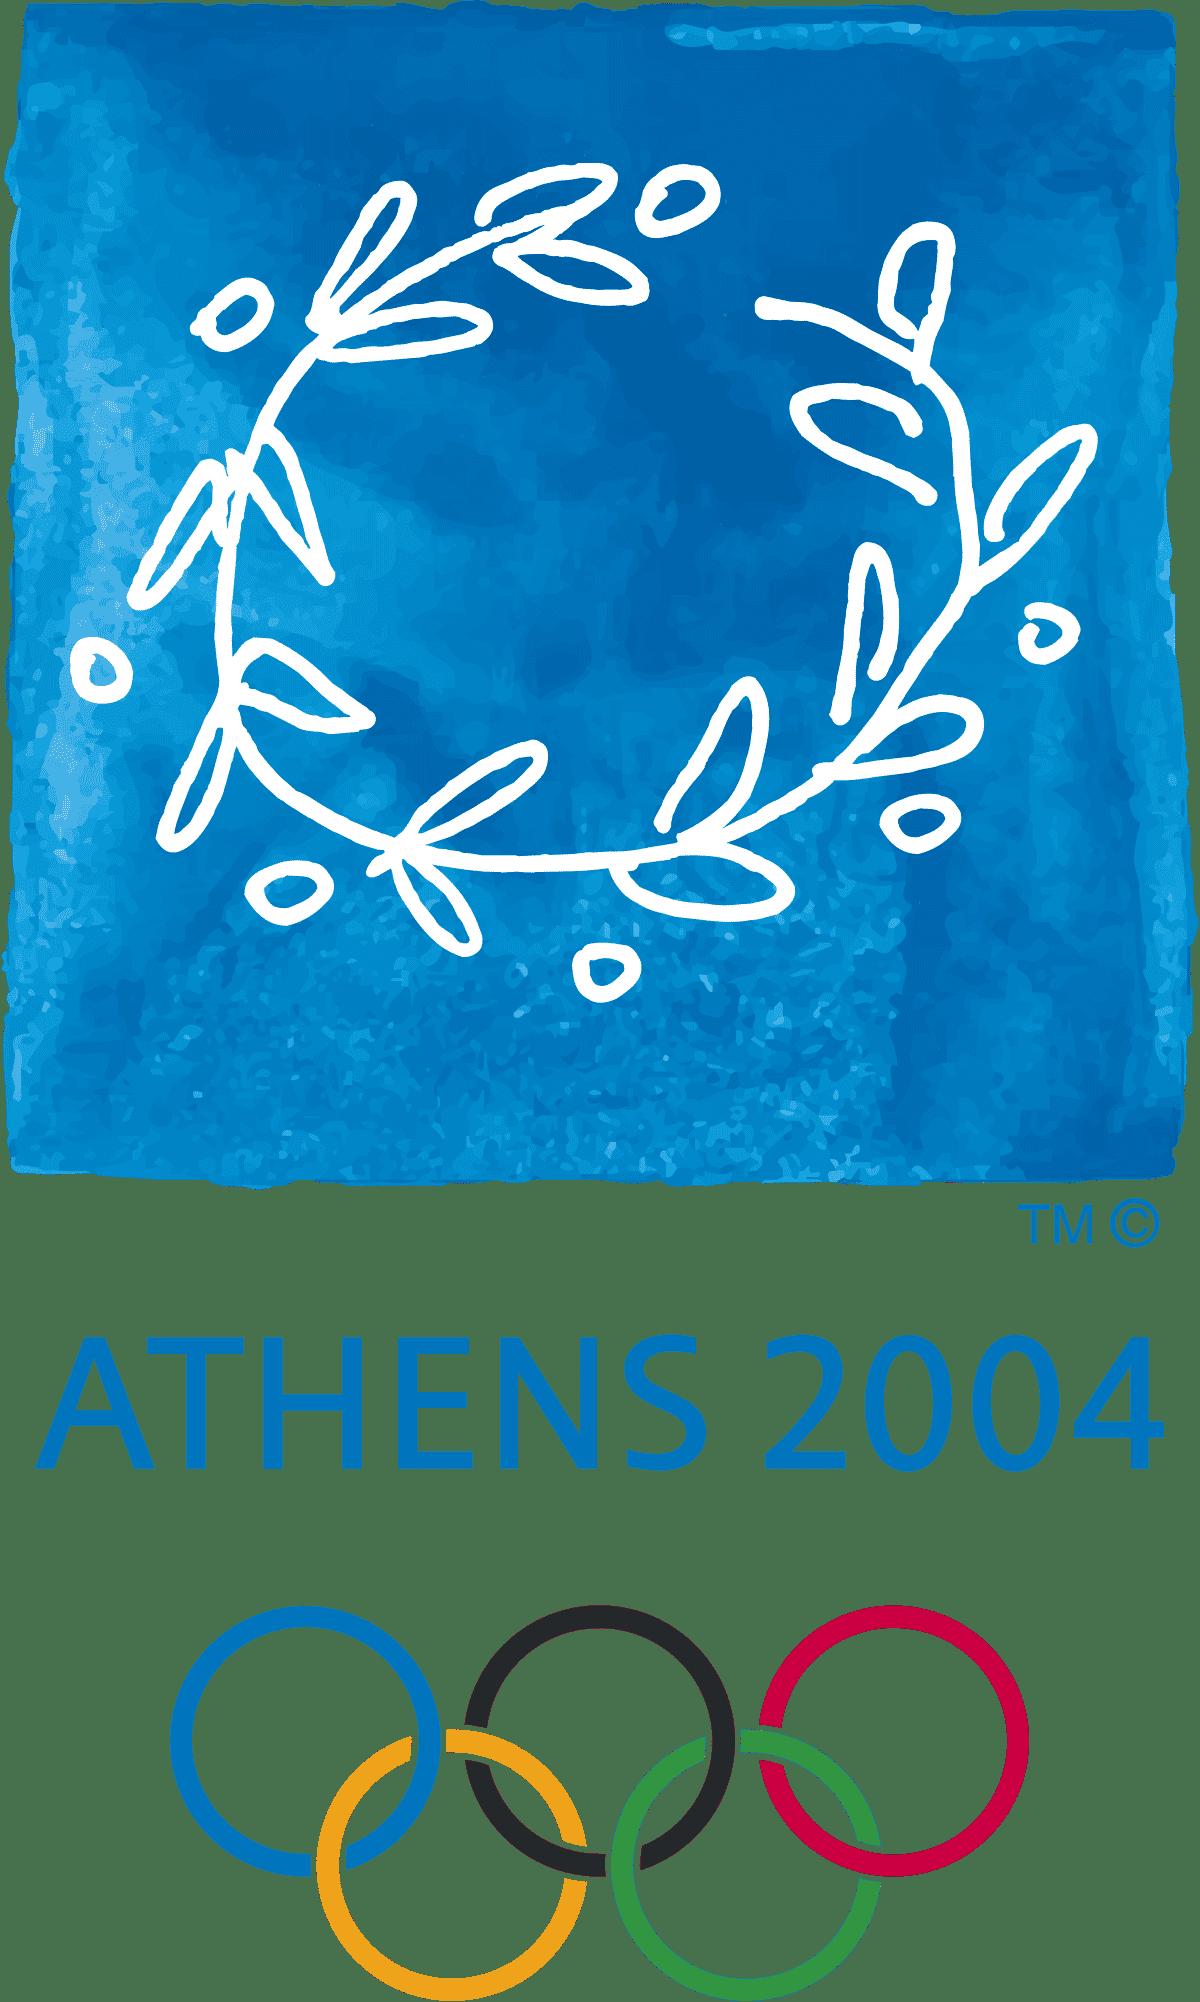 olympia wetten athen 2004